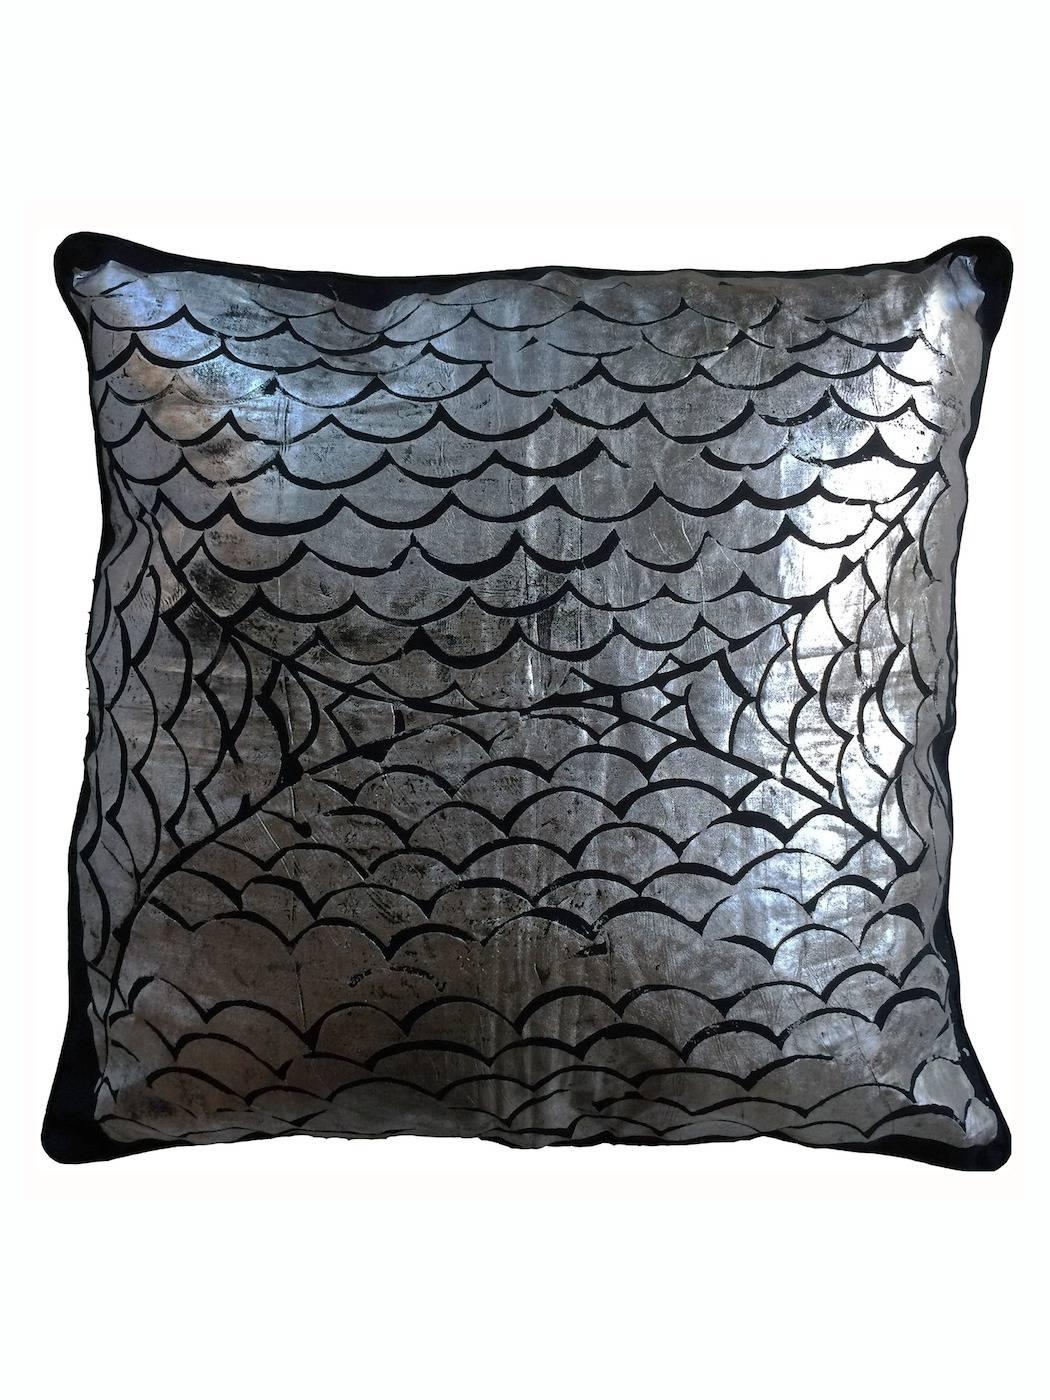 Dark Blue And Silver Mermaid Sofa Cushion Covers | Wright & Smith regarding Sofa Cushion Covers (Image 4 of 15)